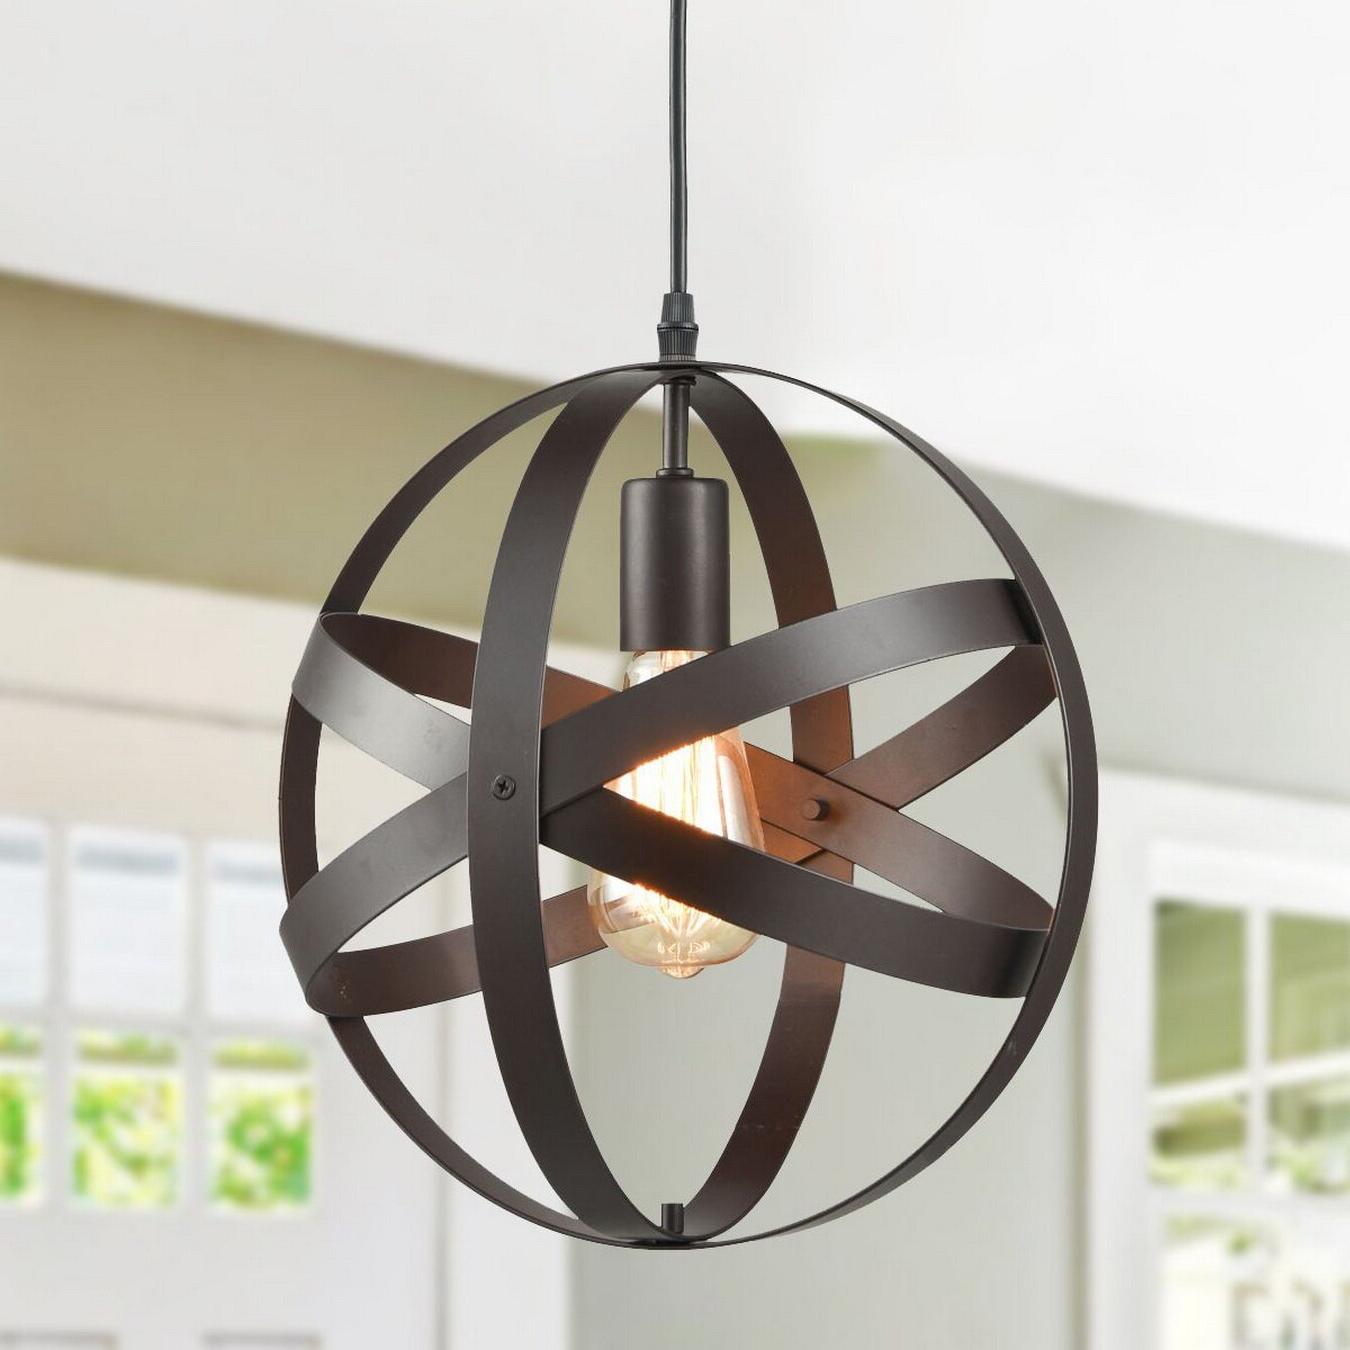 Mattie 1 Light Single Globe Pendant Pertaining To Well Known Kilby 1 Light Pendants (View 14 of 20)